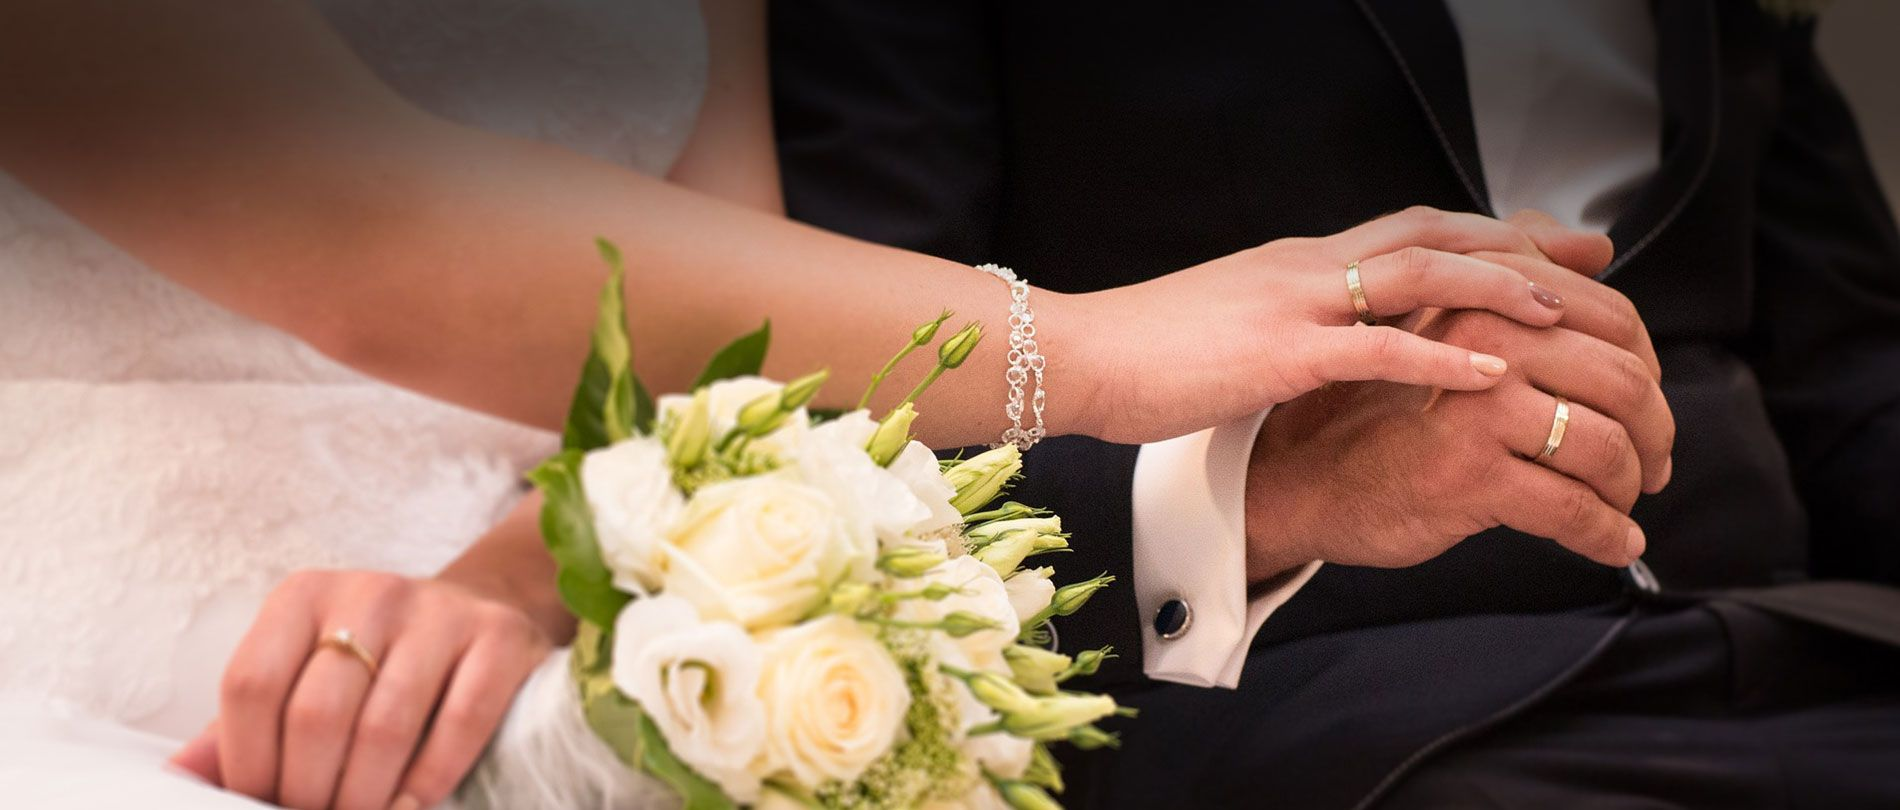 Private Deck Wedding Cruises